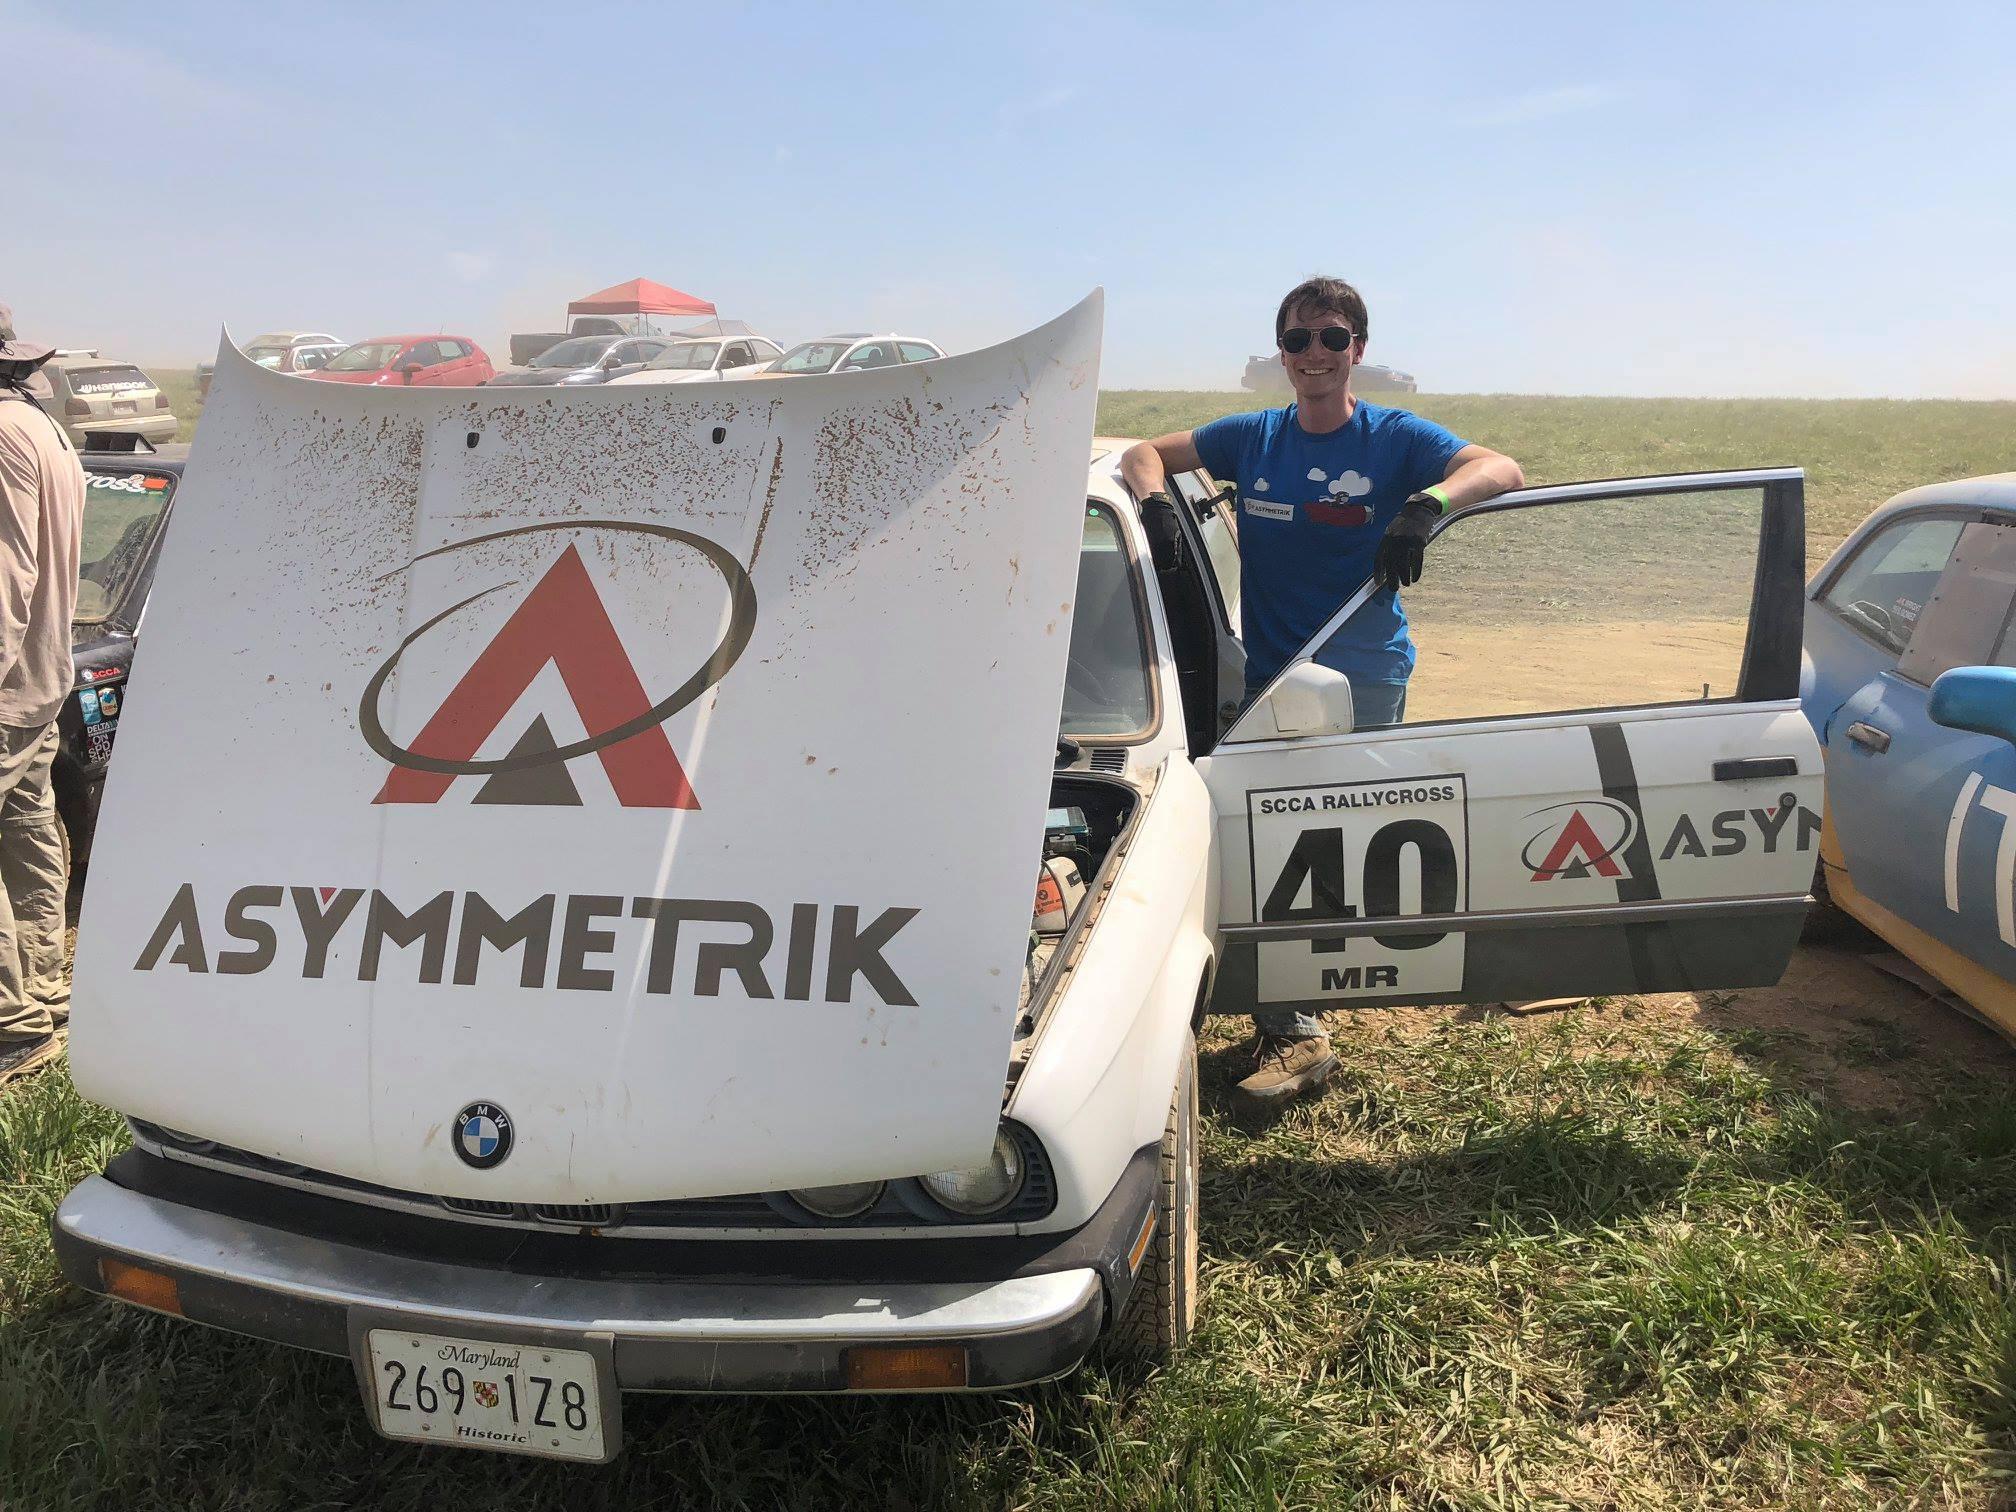 Asymmetrik Rallycar Rallycross